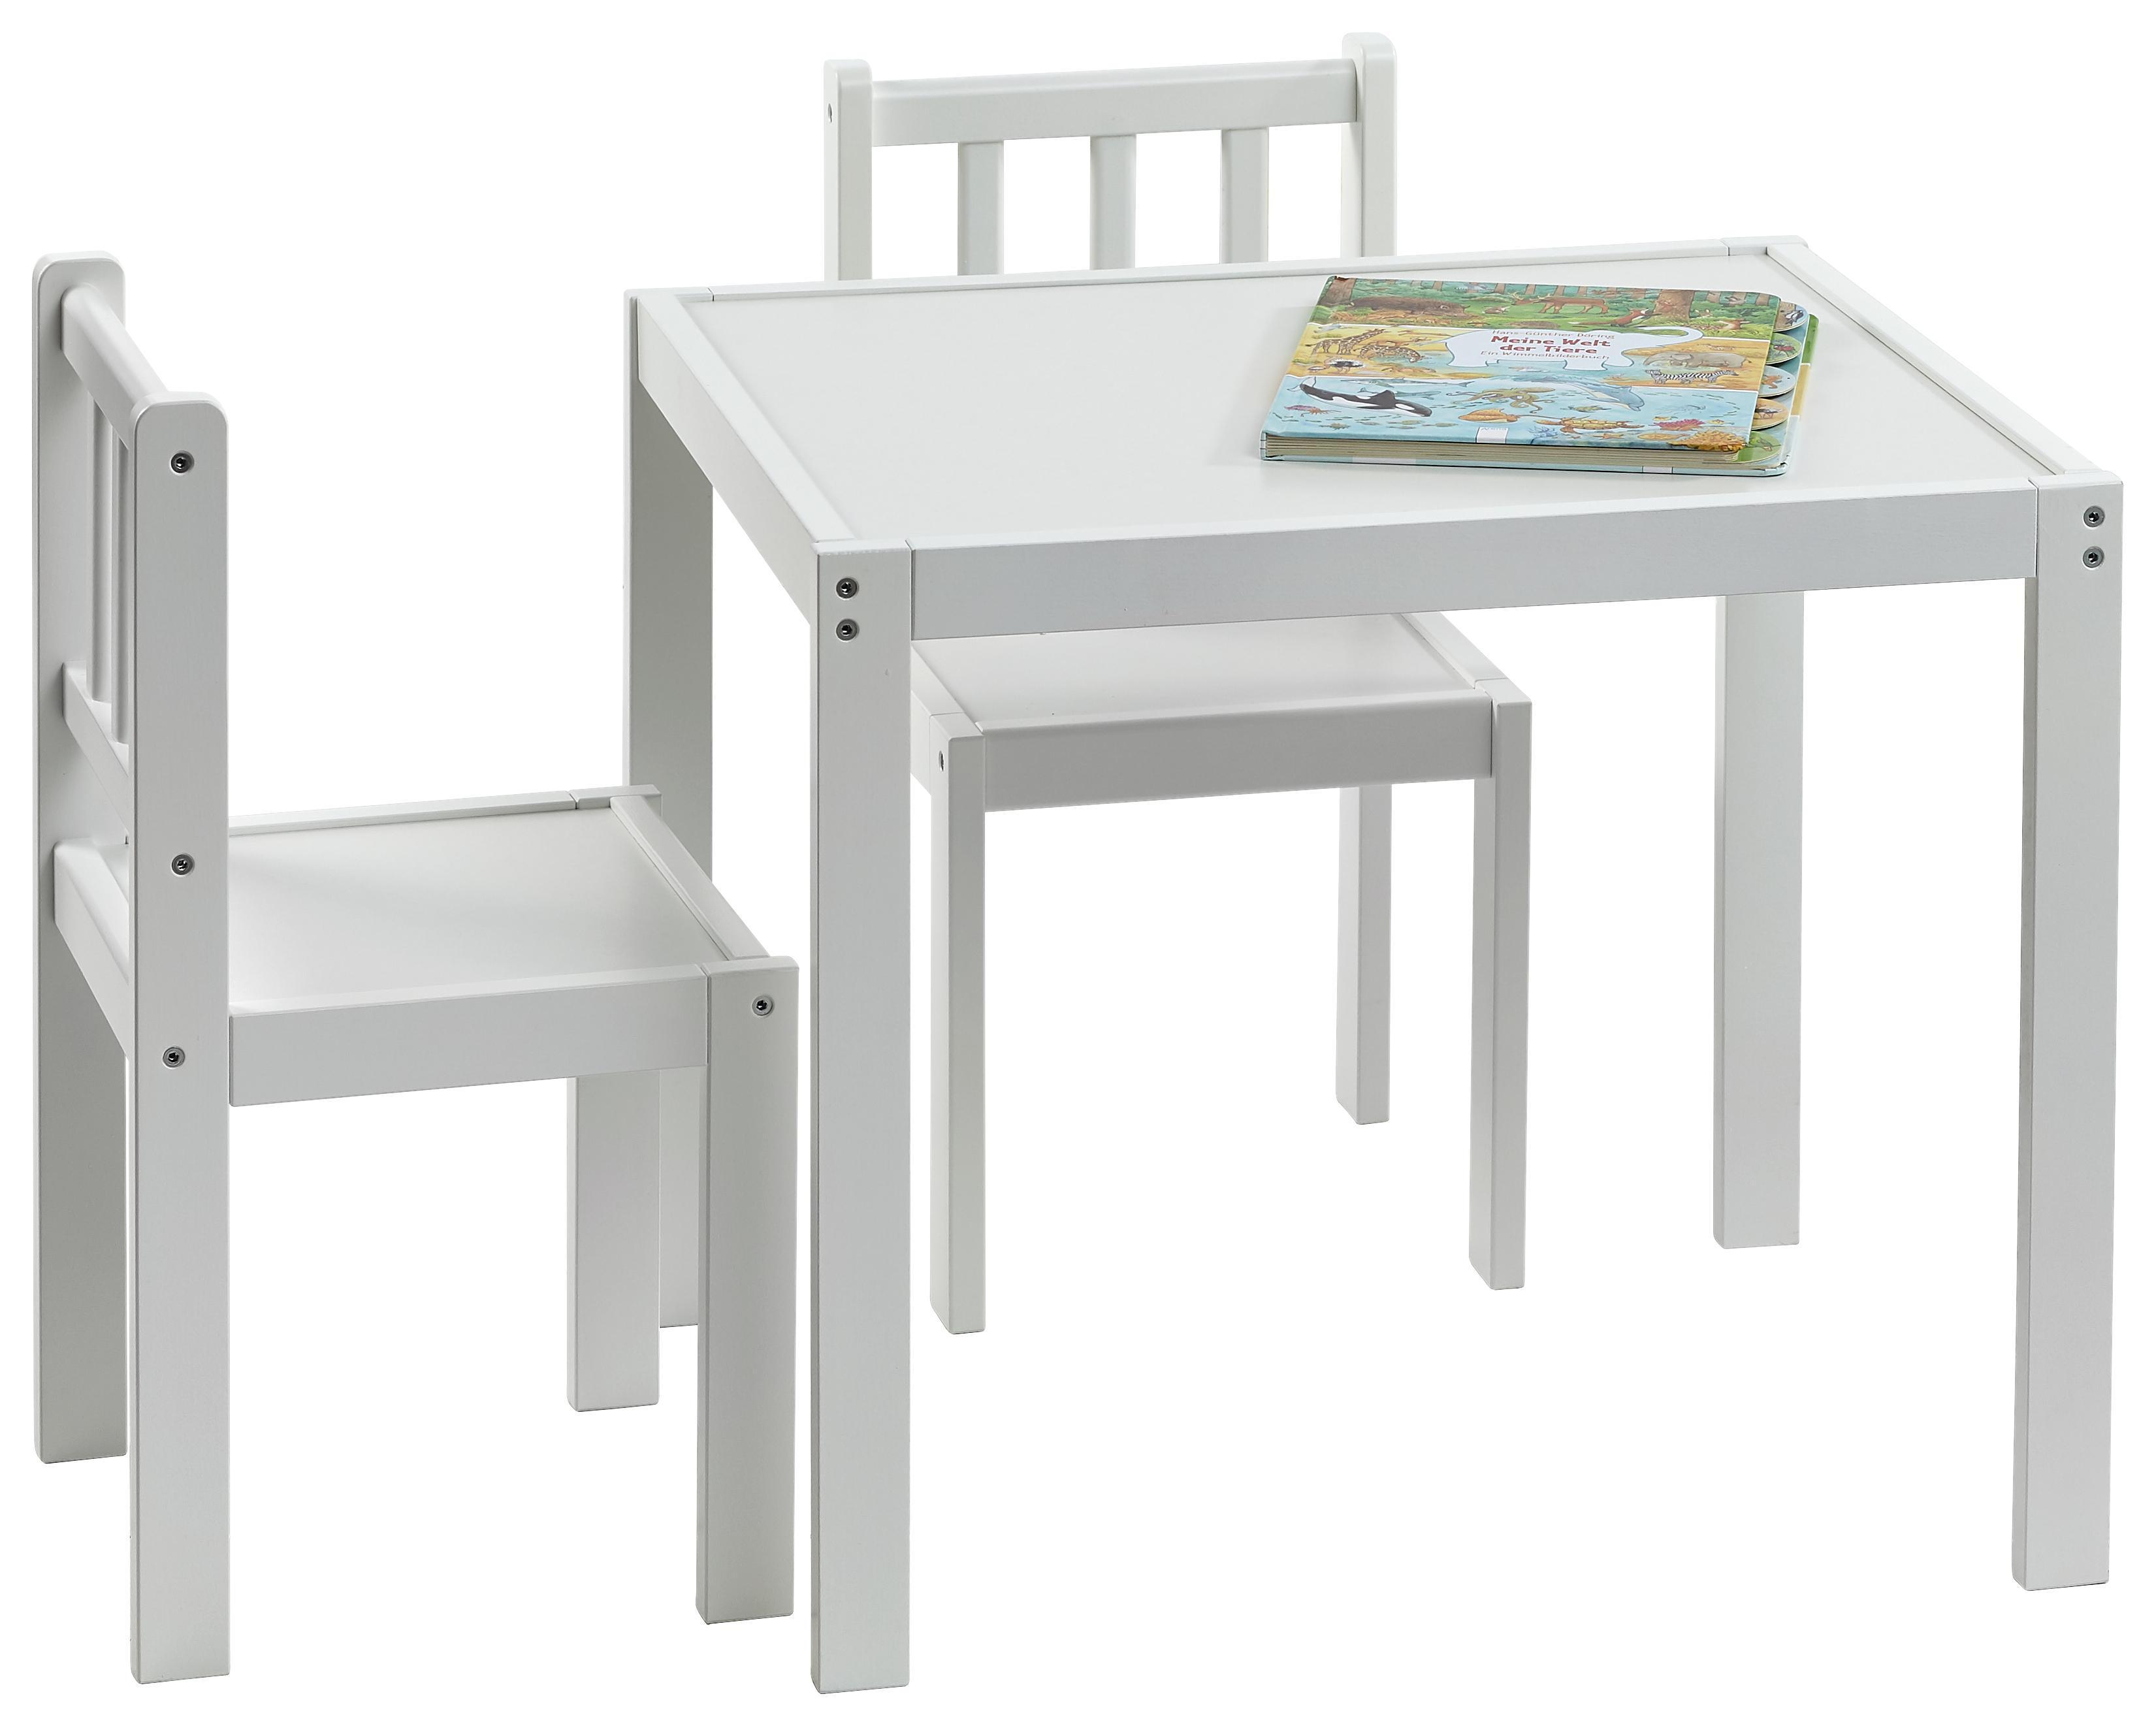 Kindersitzgruppen Online Shoppen Xxxlutz